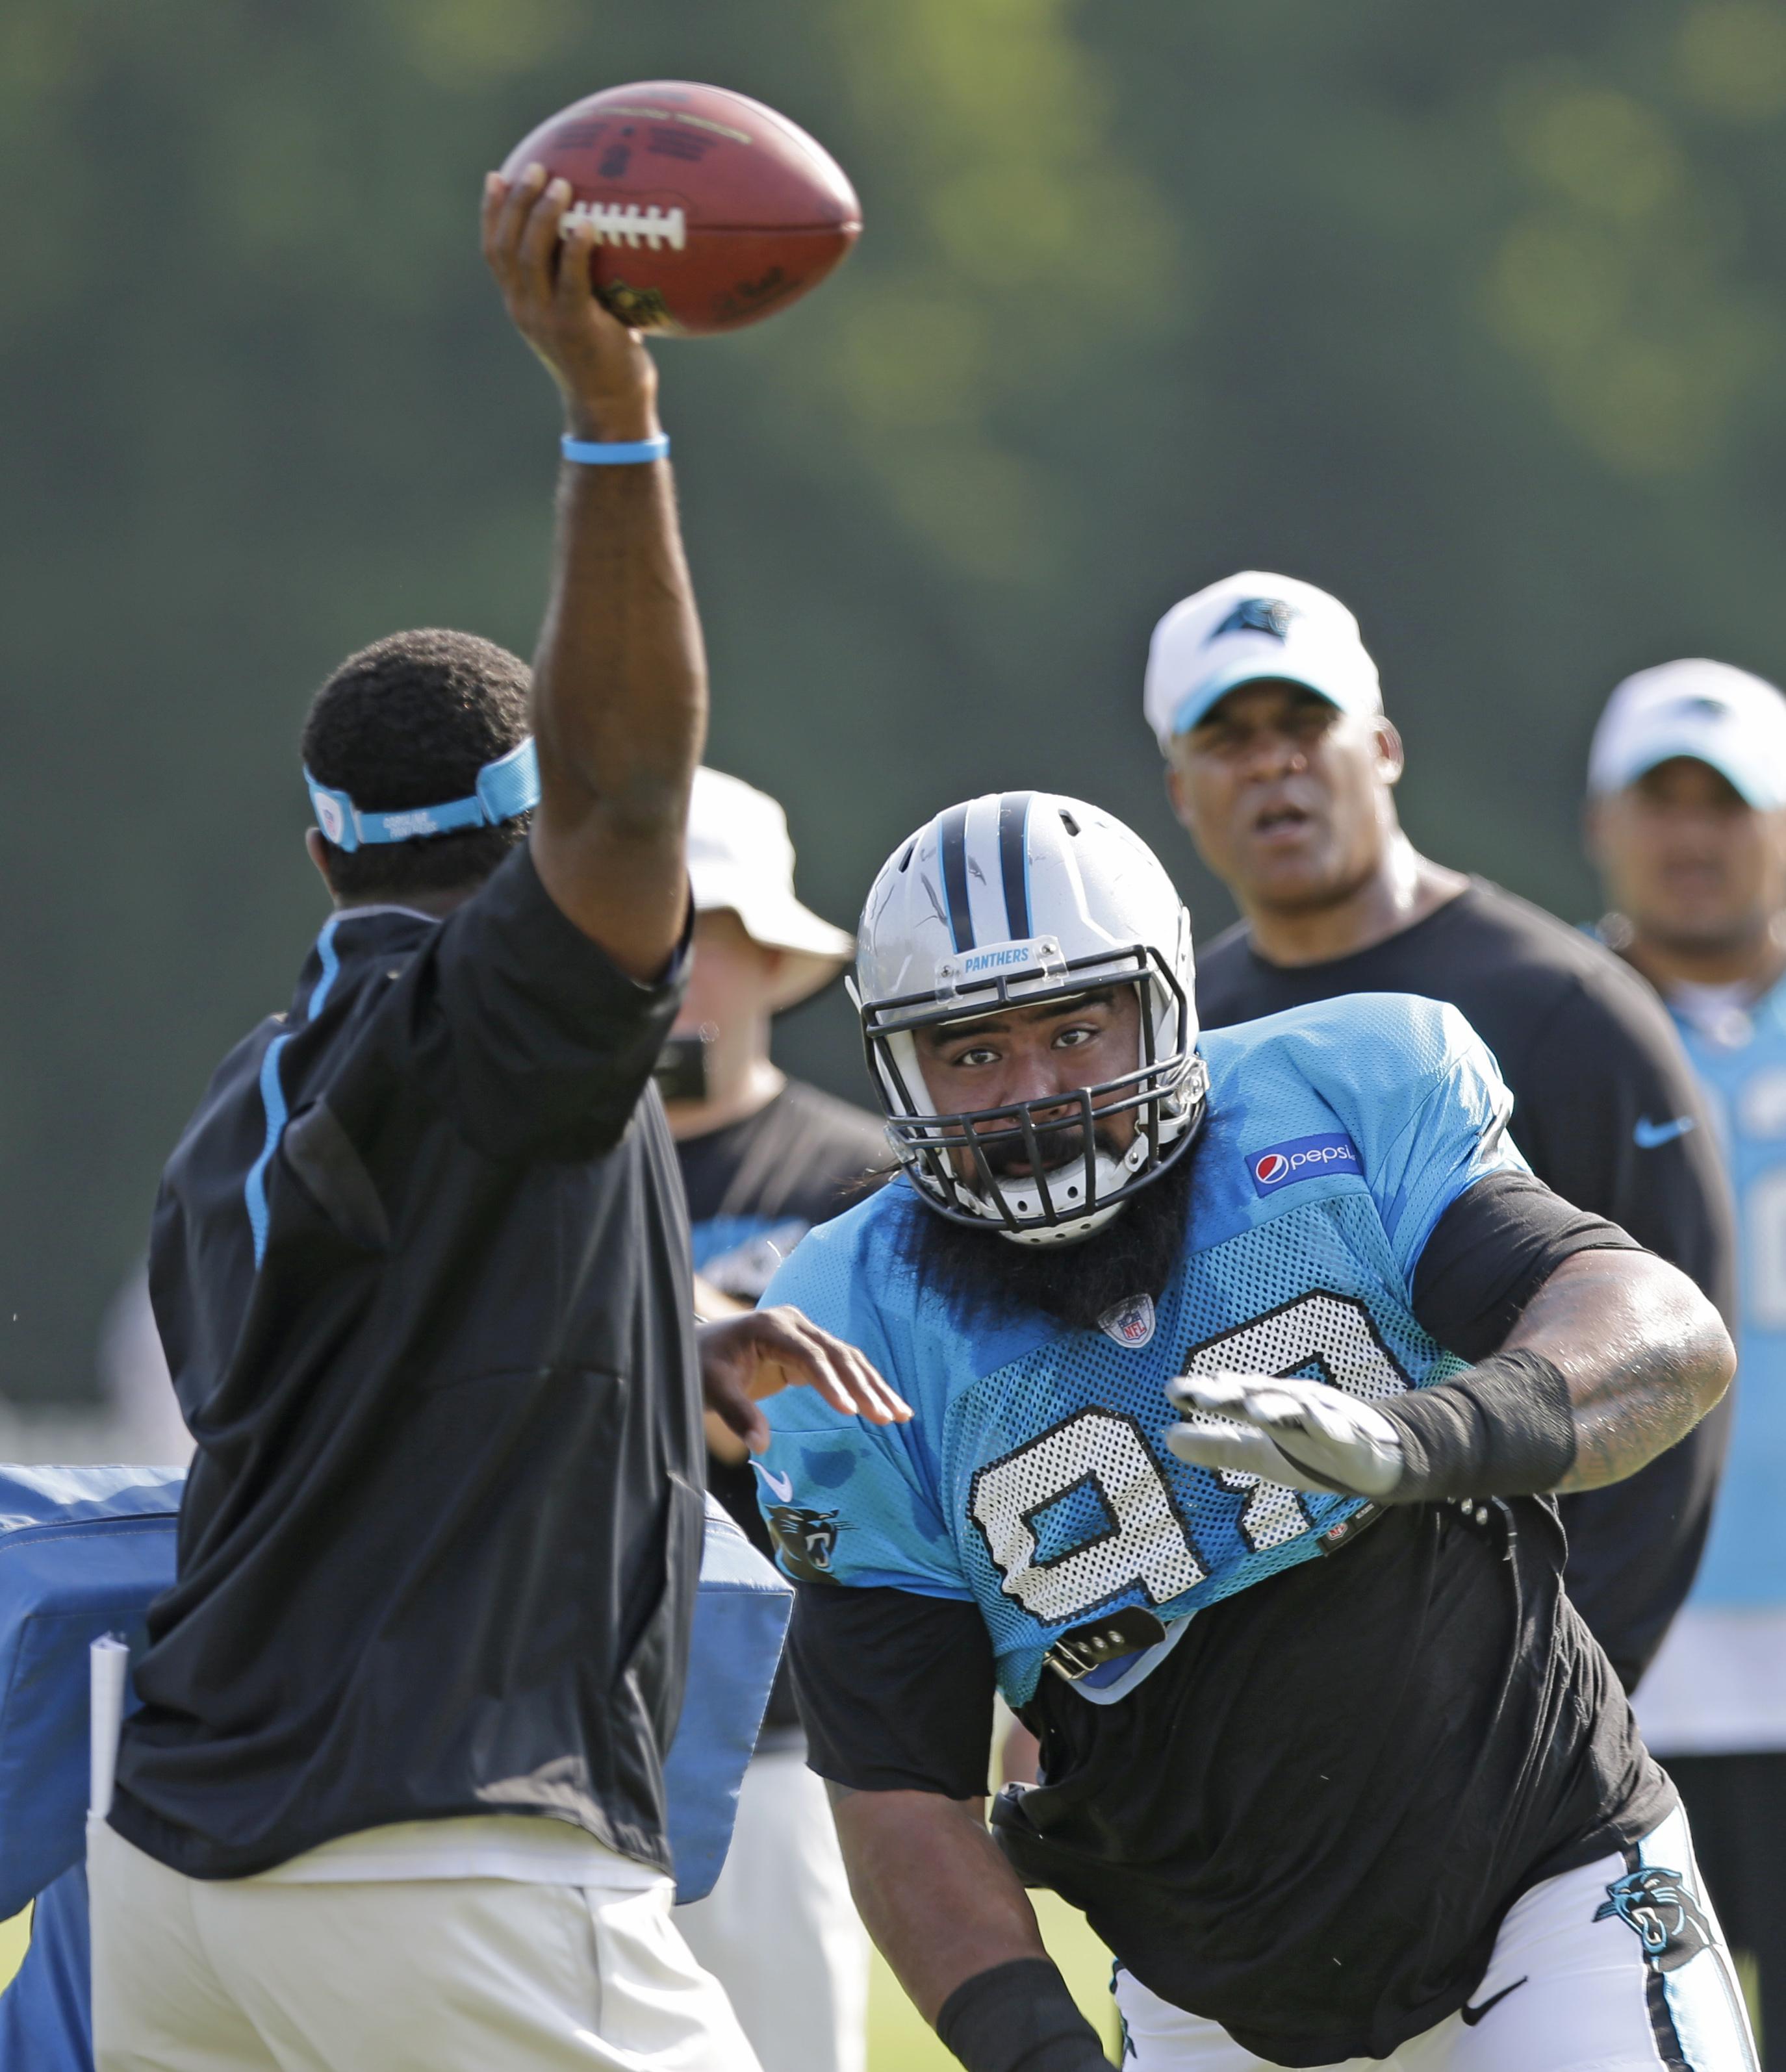 Carolina Panthers' Star Lotulelei (98) runs a drill during the NFL football team's training camp in Spartanburg, S.C., Monday, Aug. 3, 2015. (AP Photo/Chuck Burton)